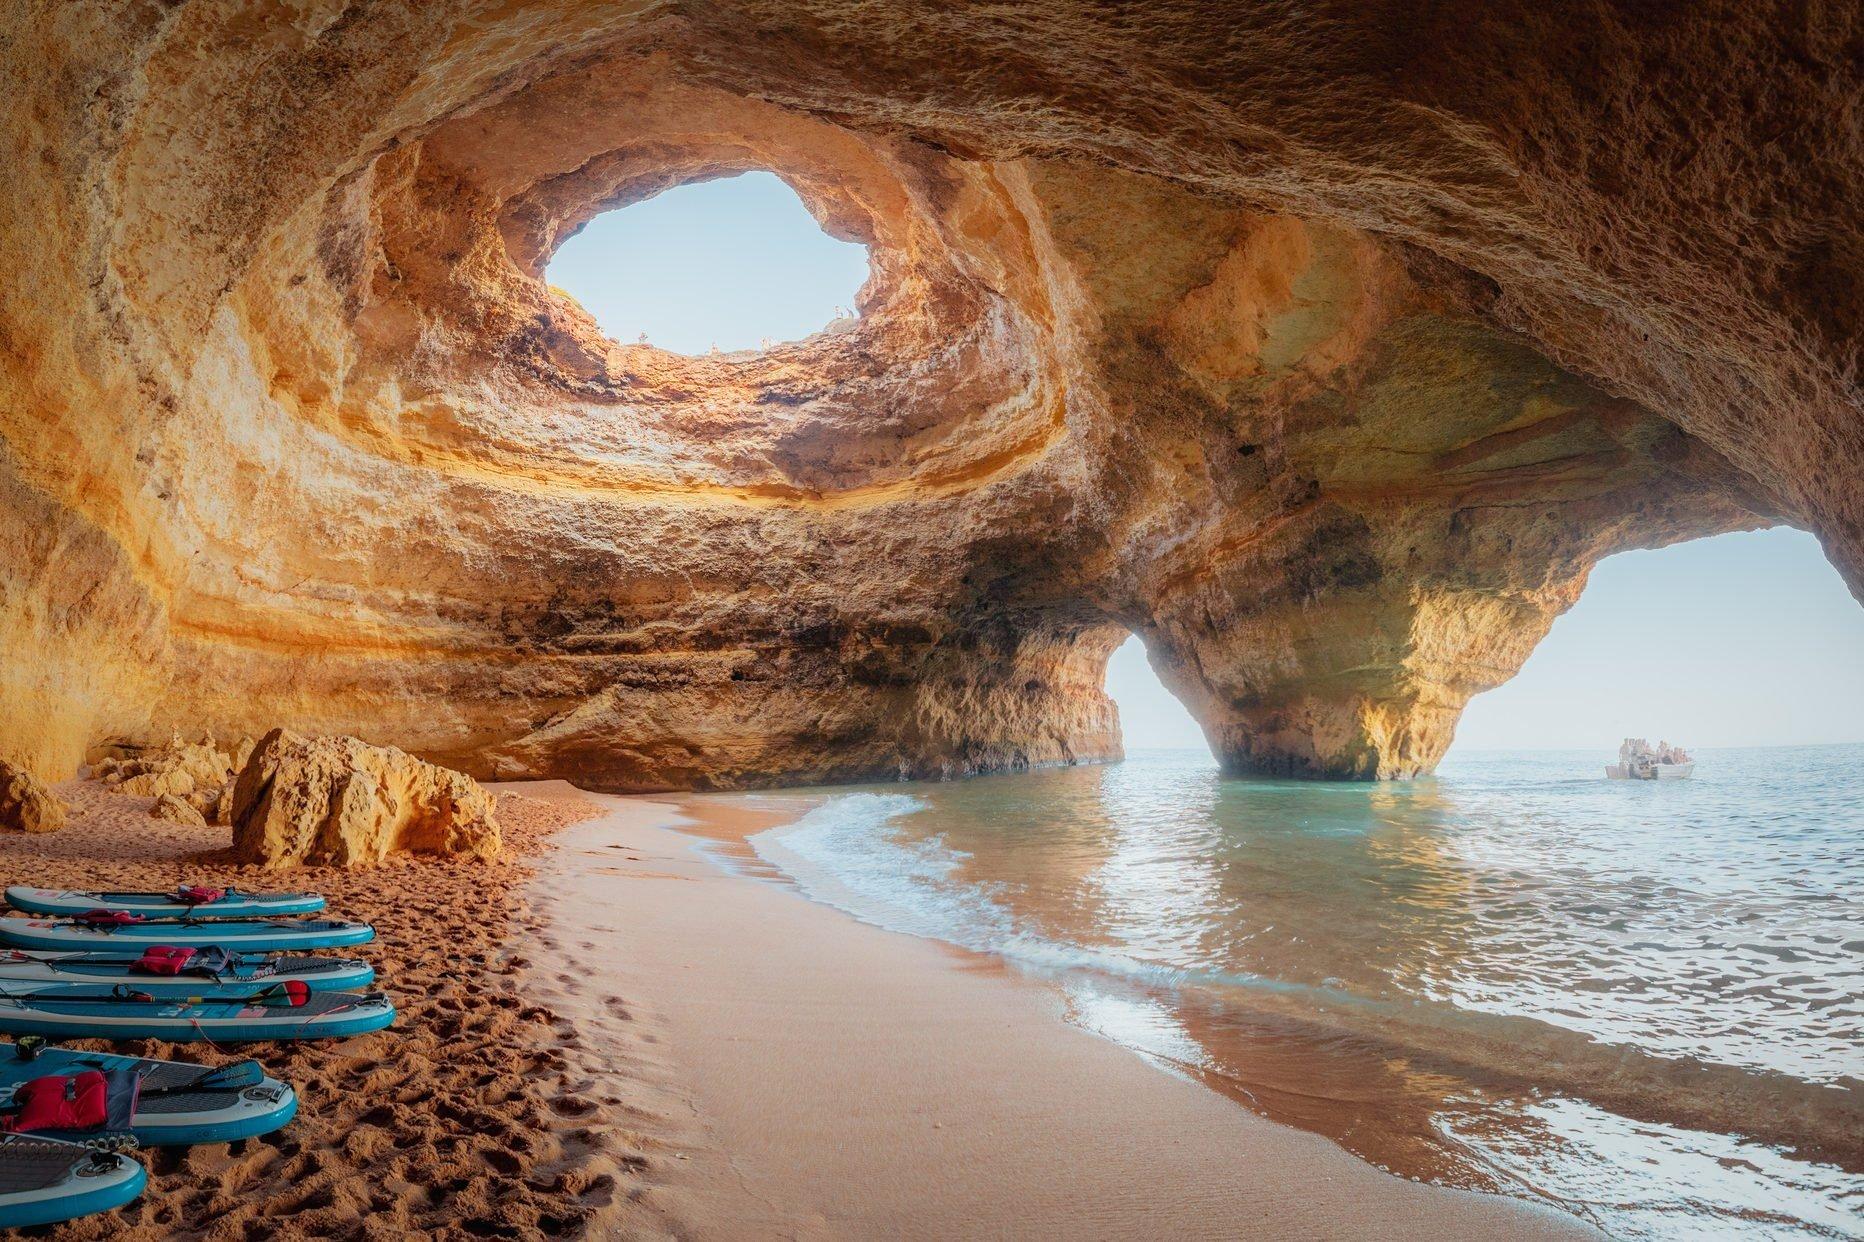 Benagil Cave, Algarve, Portugal. SUP boards and beach